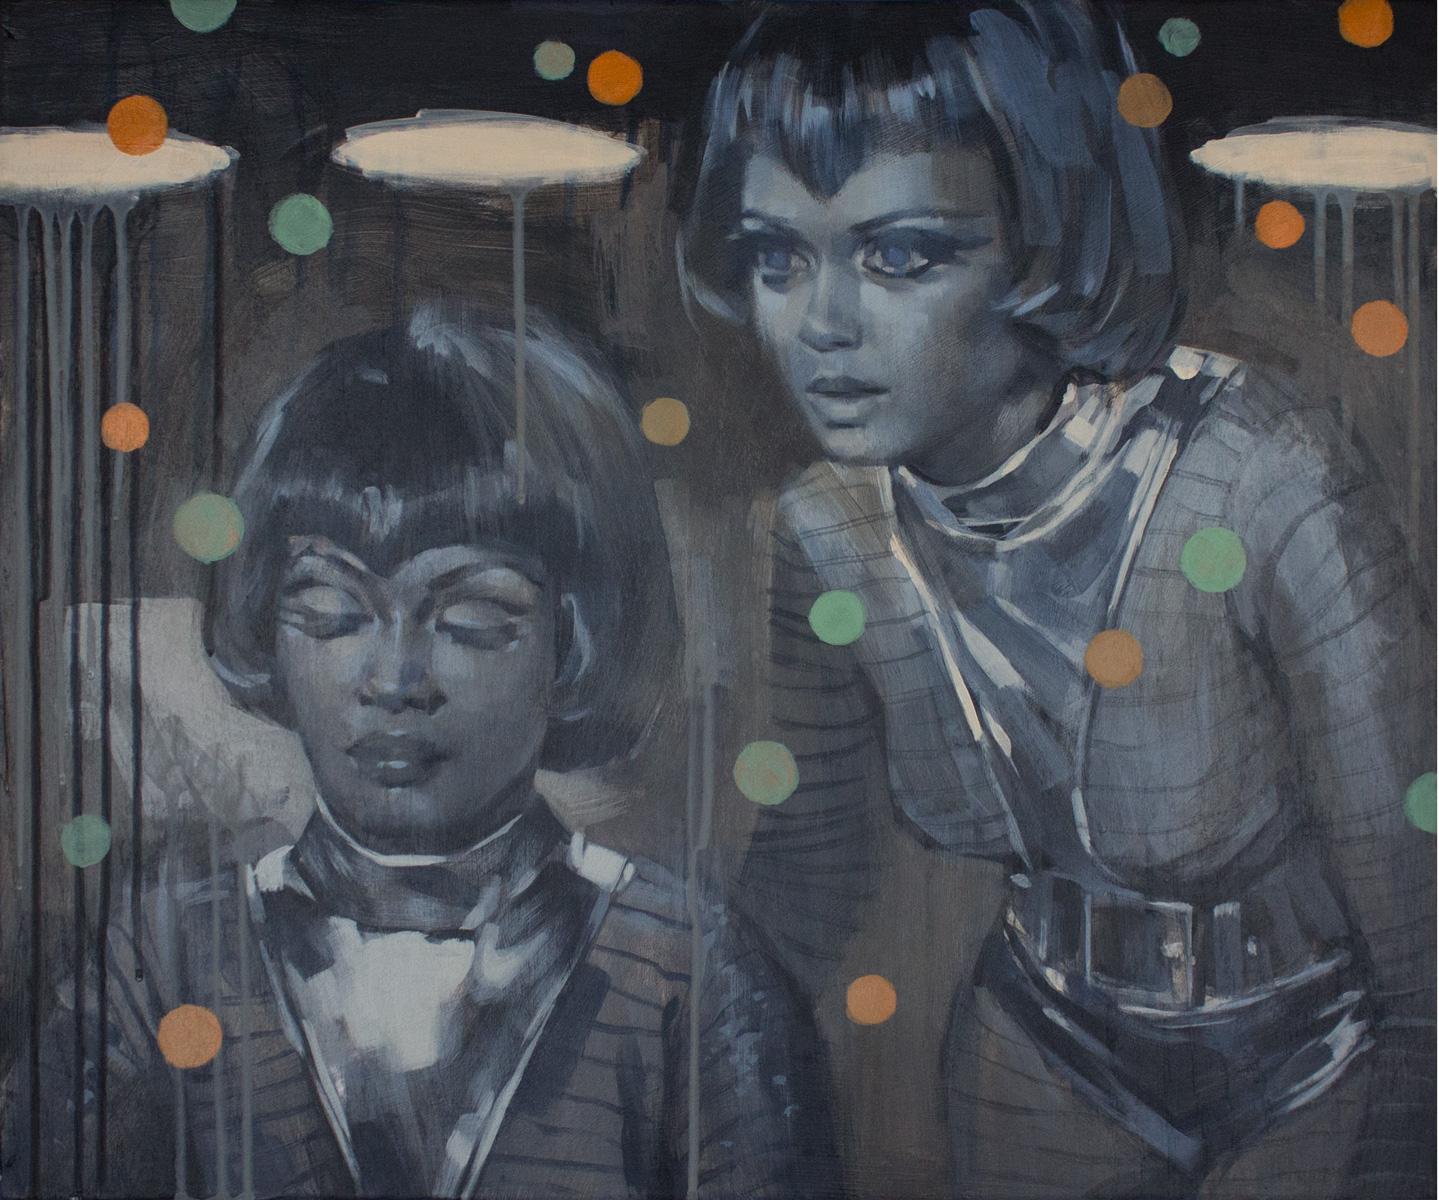 Glenn Barr   Moon Dust   Acrylic on Cradled Wood Panel  24 x 20 x 2 Inches    SOLD